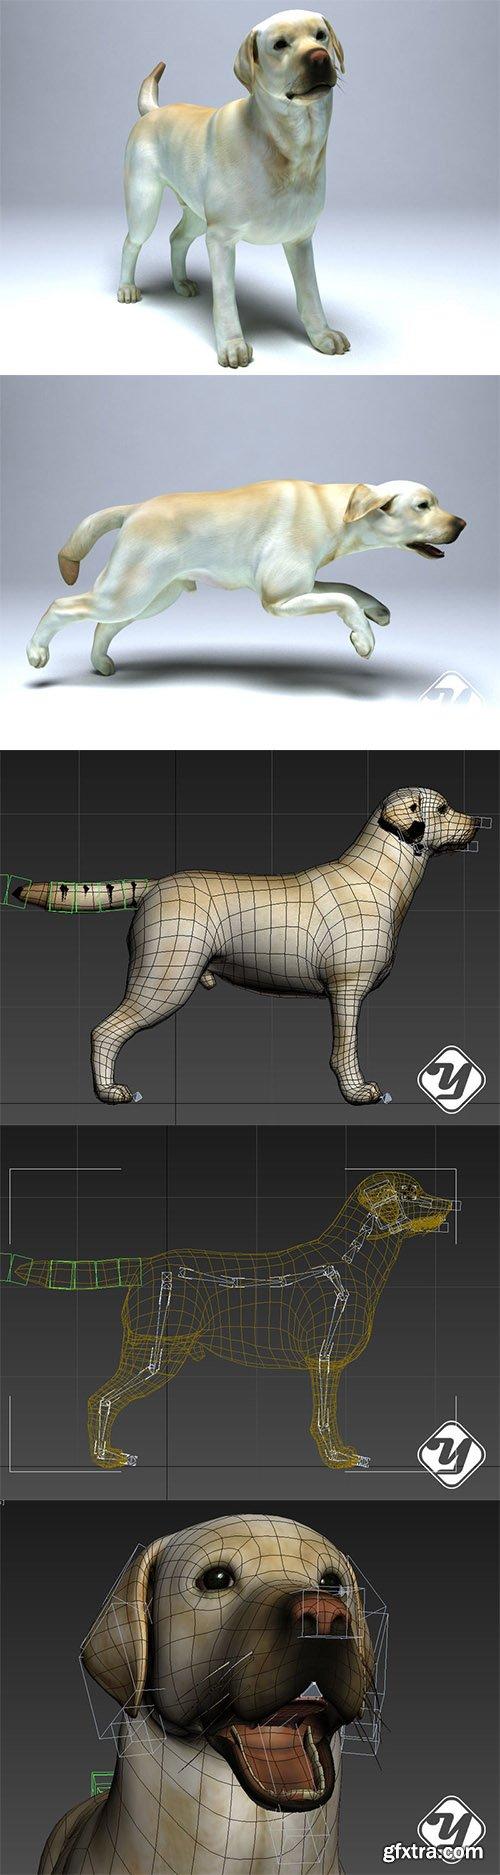 Cgtrader - Labrador Dog Low-poly 3D model